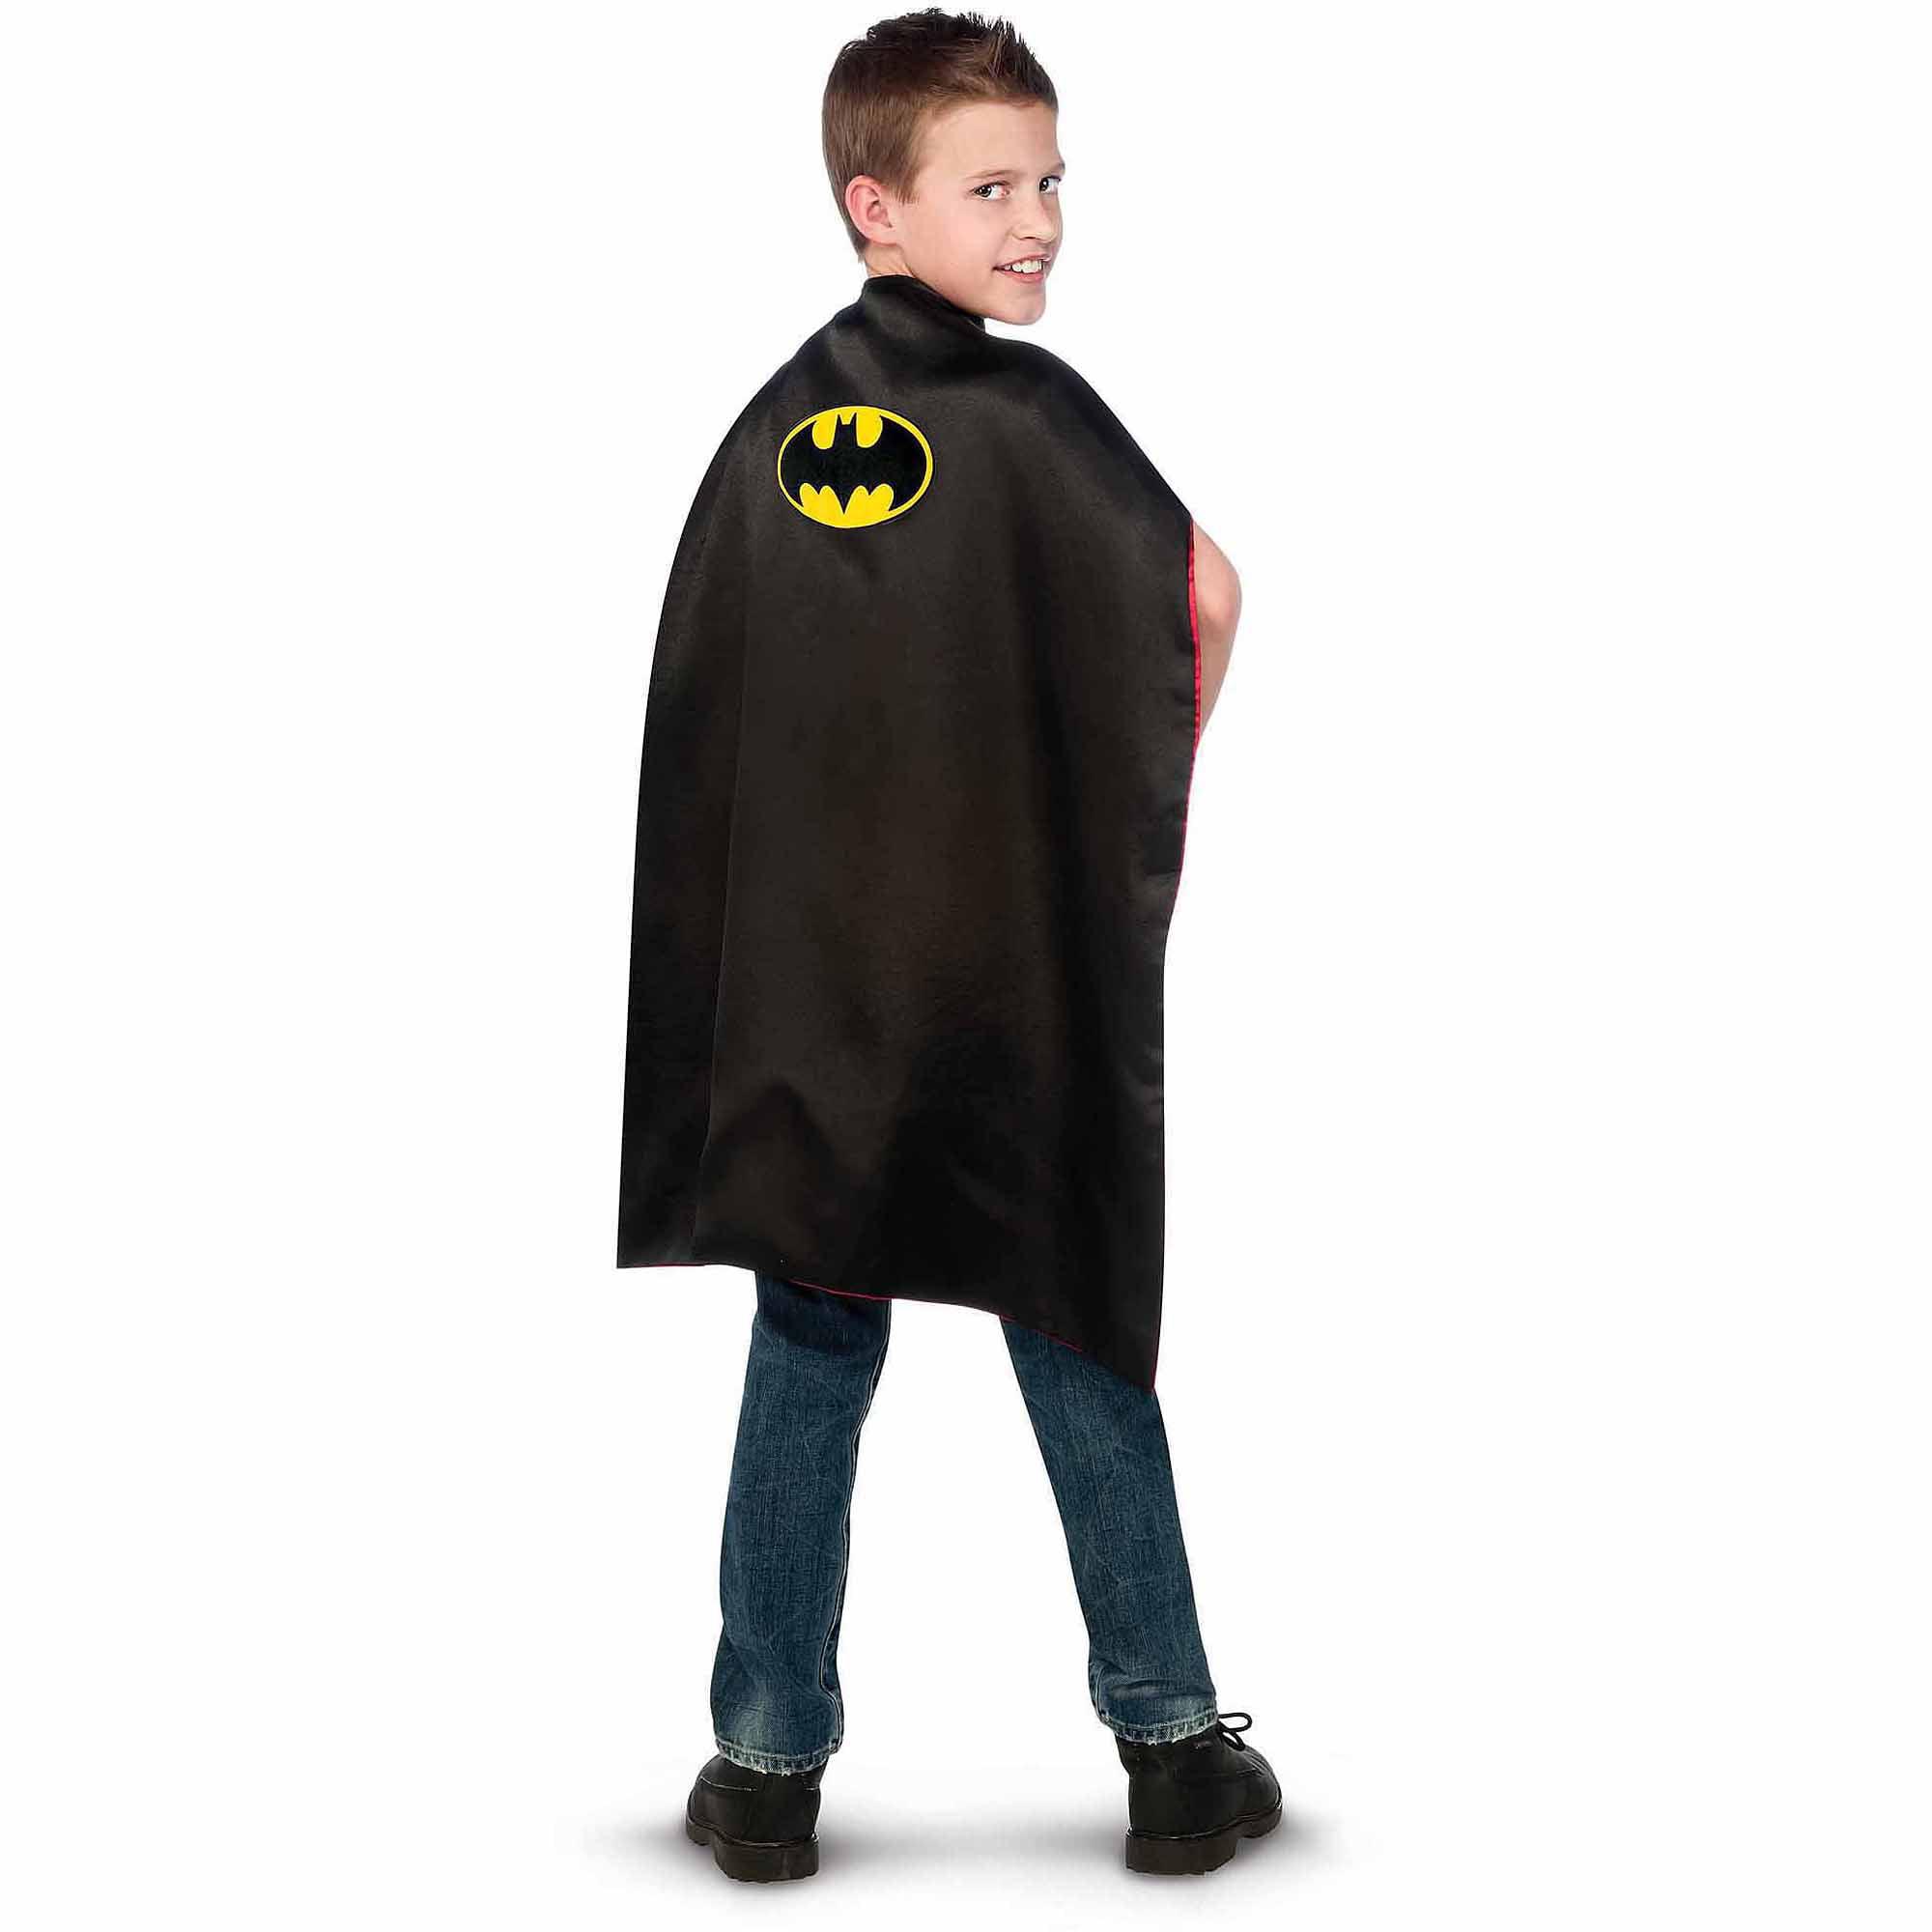 batman to superman reversible cape child halloween costume accessory walmartcom - Halloween Costumes With A Cape